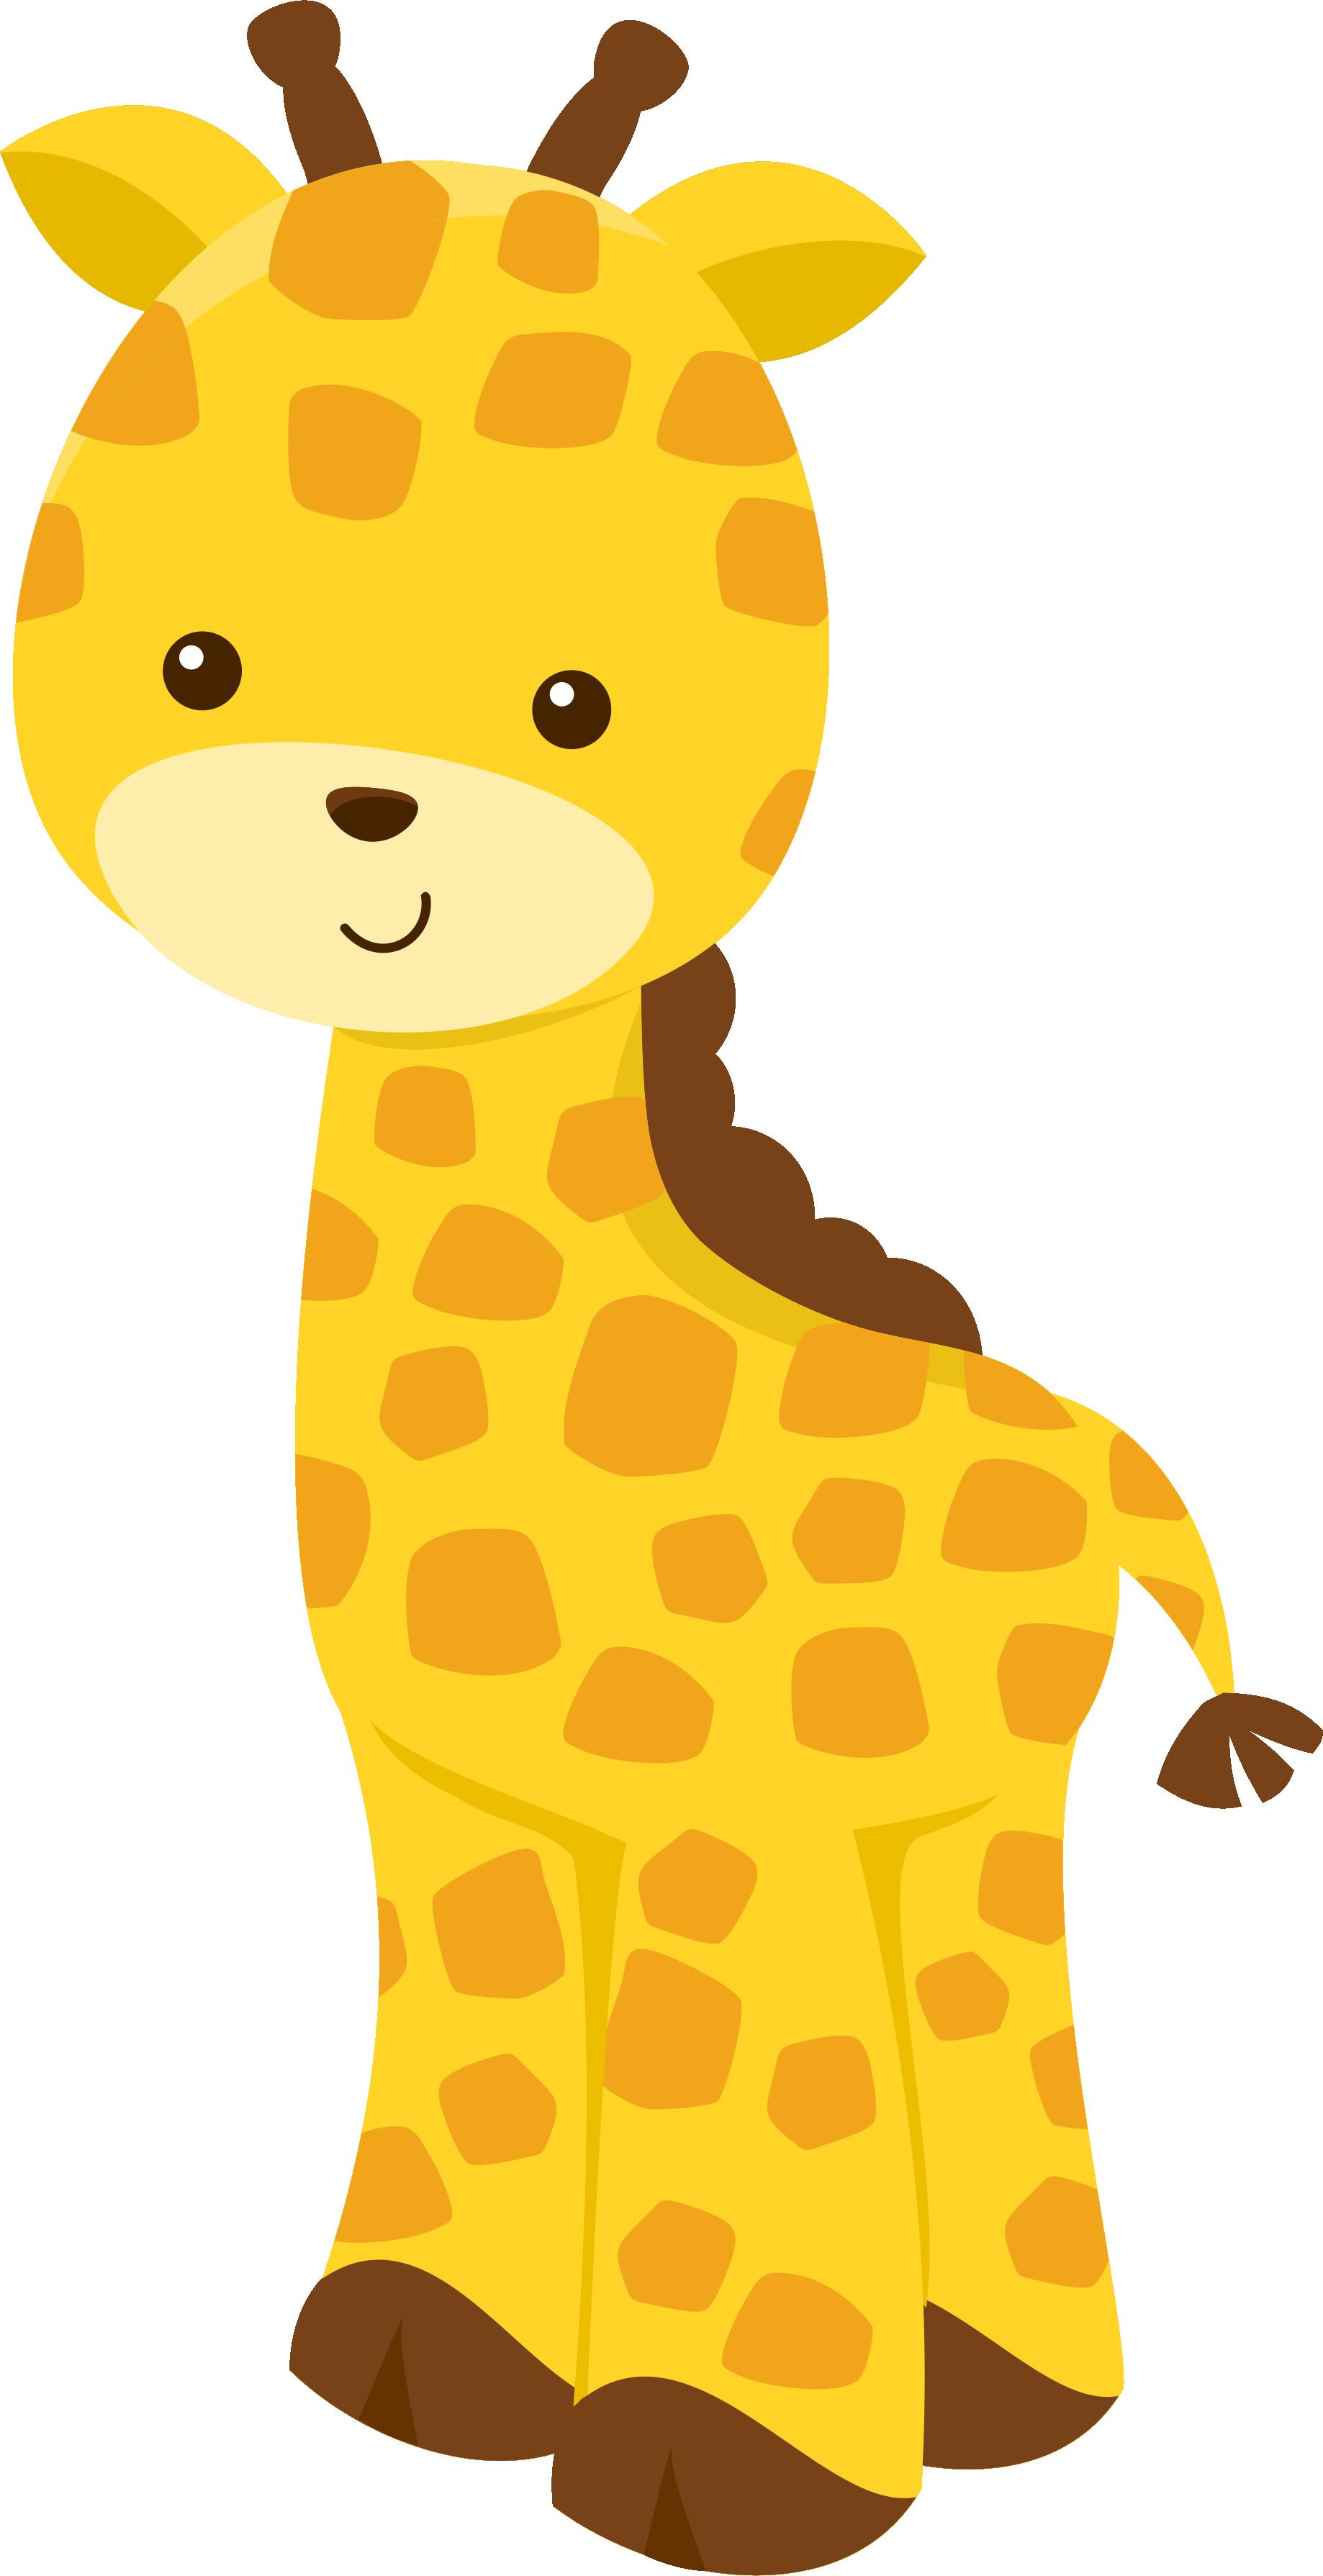 Girafa safari png clipart images gallery for free download.